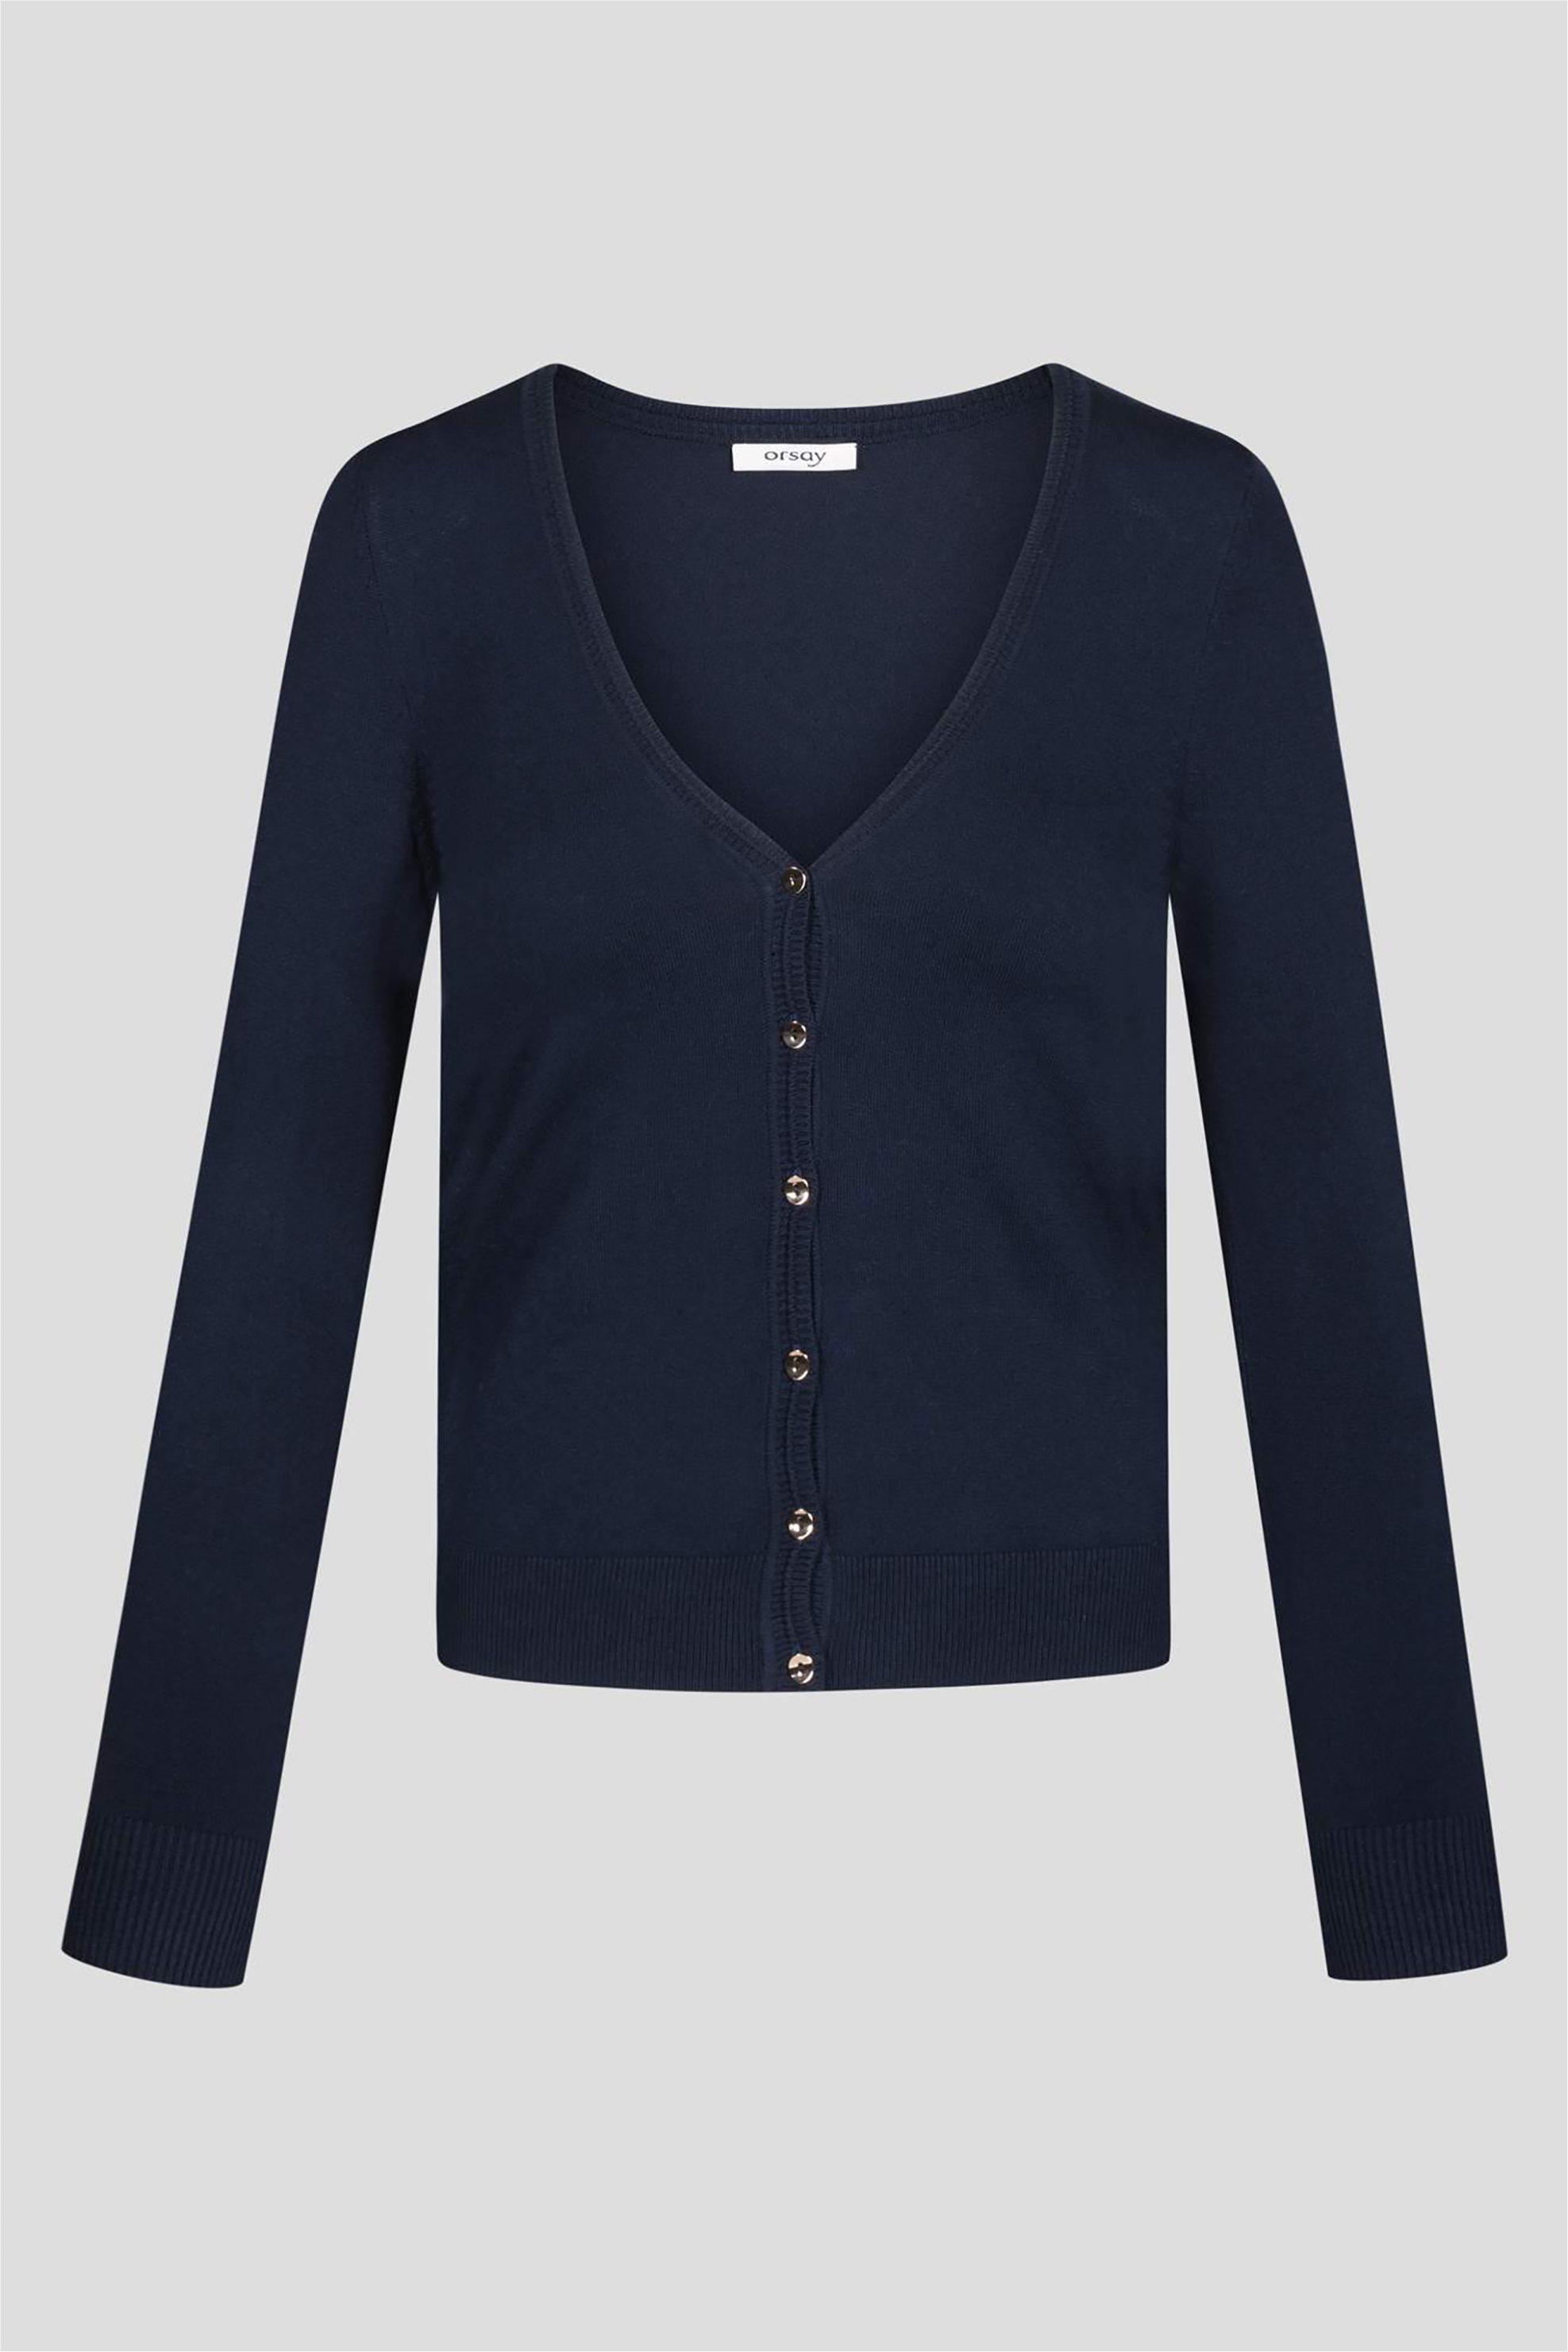 Orsay γυναικεία μονόχρωμη ζακέτα - 510070-526000 - Μπλε Σκούρο